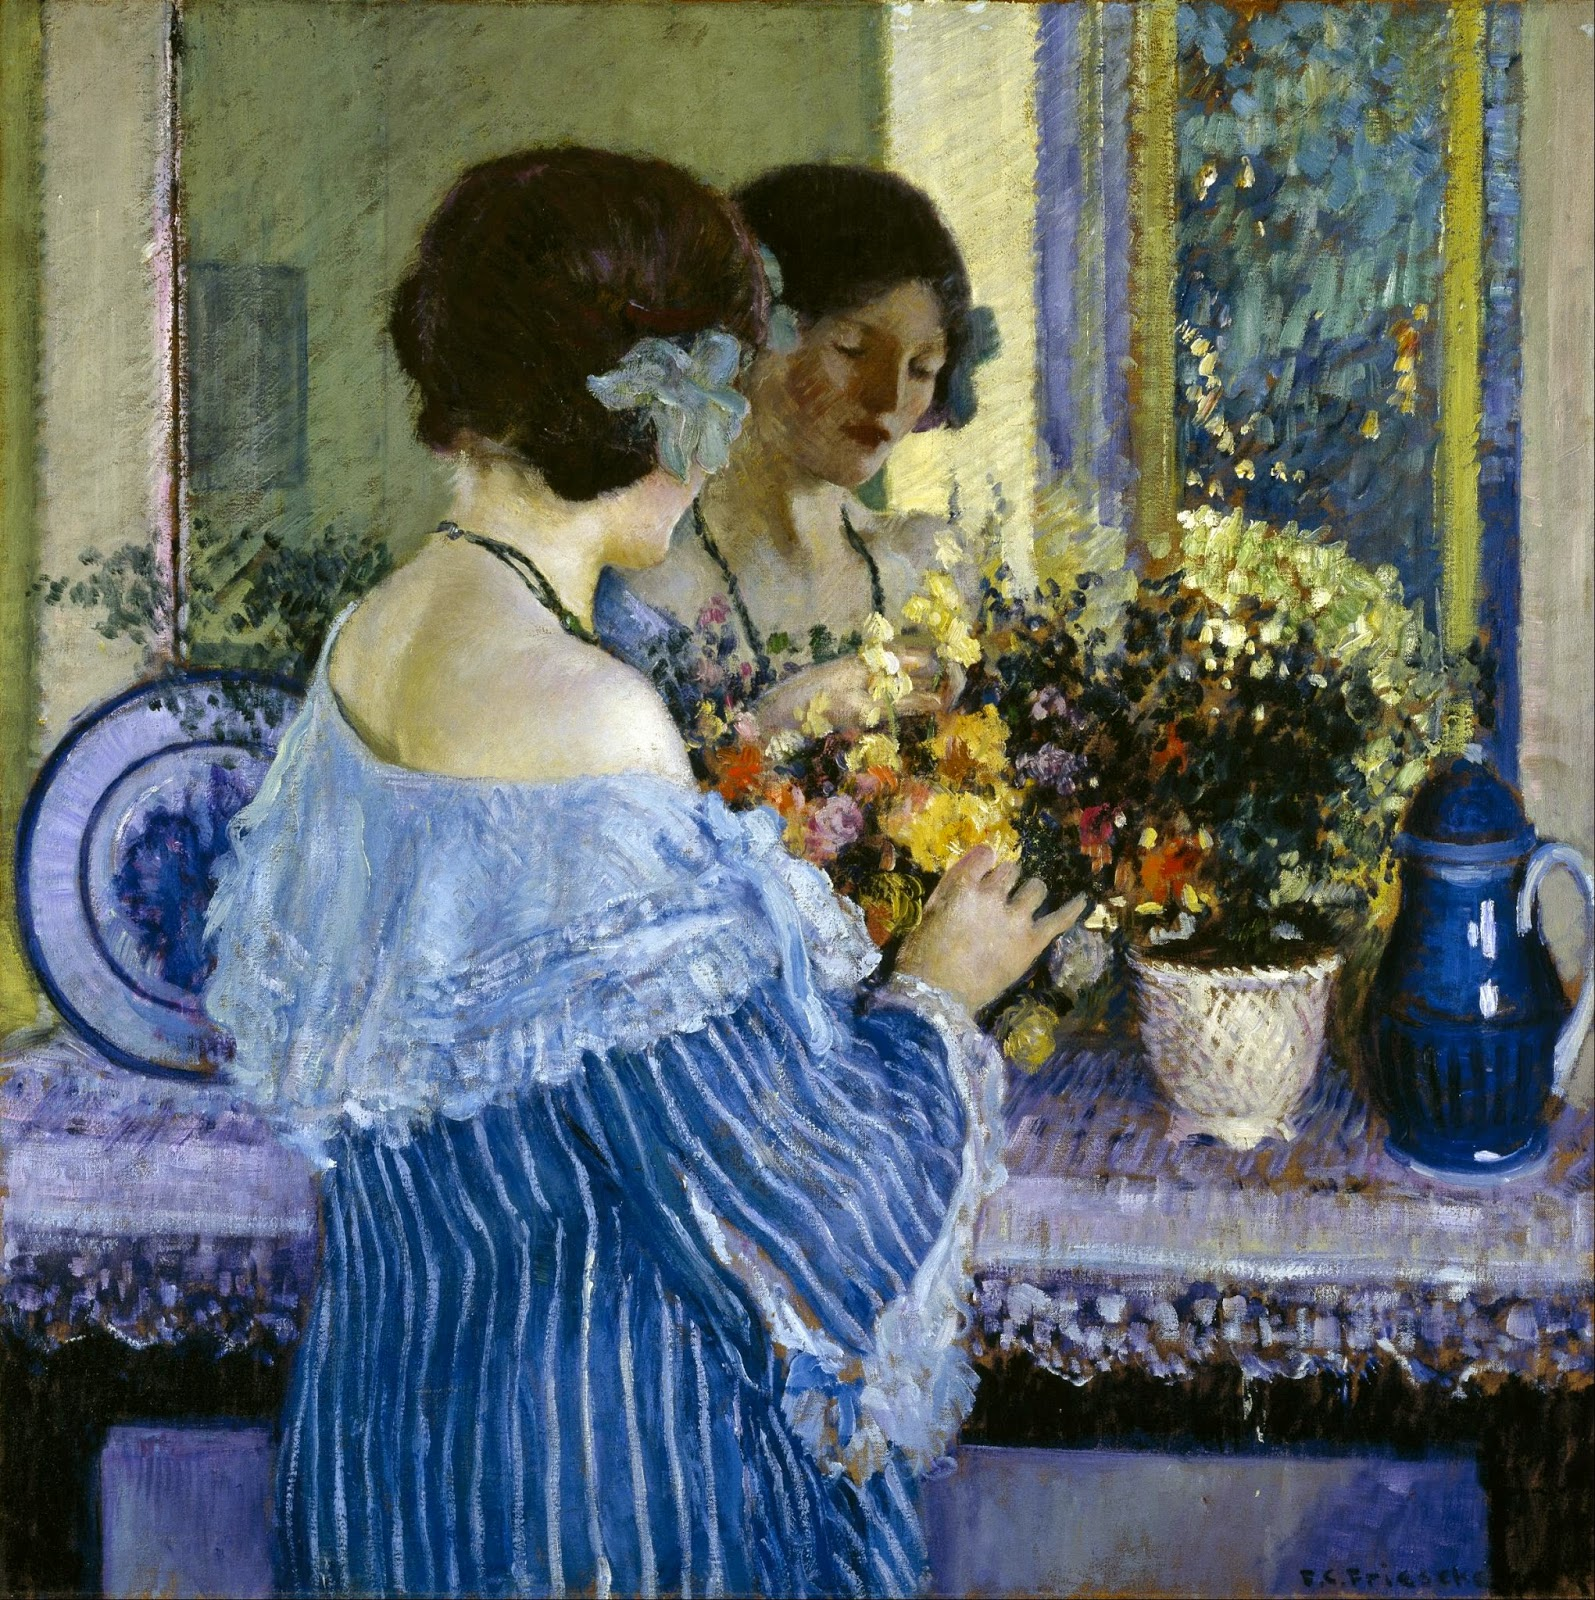 fata-in-albastru-aranjand-florile-frieseke-1915